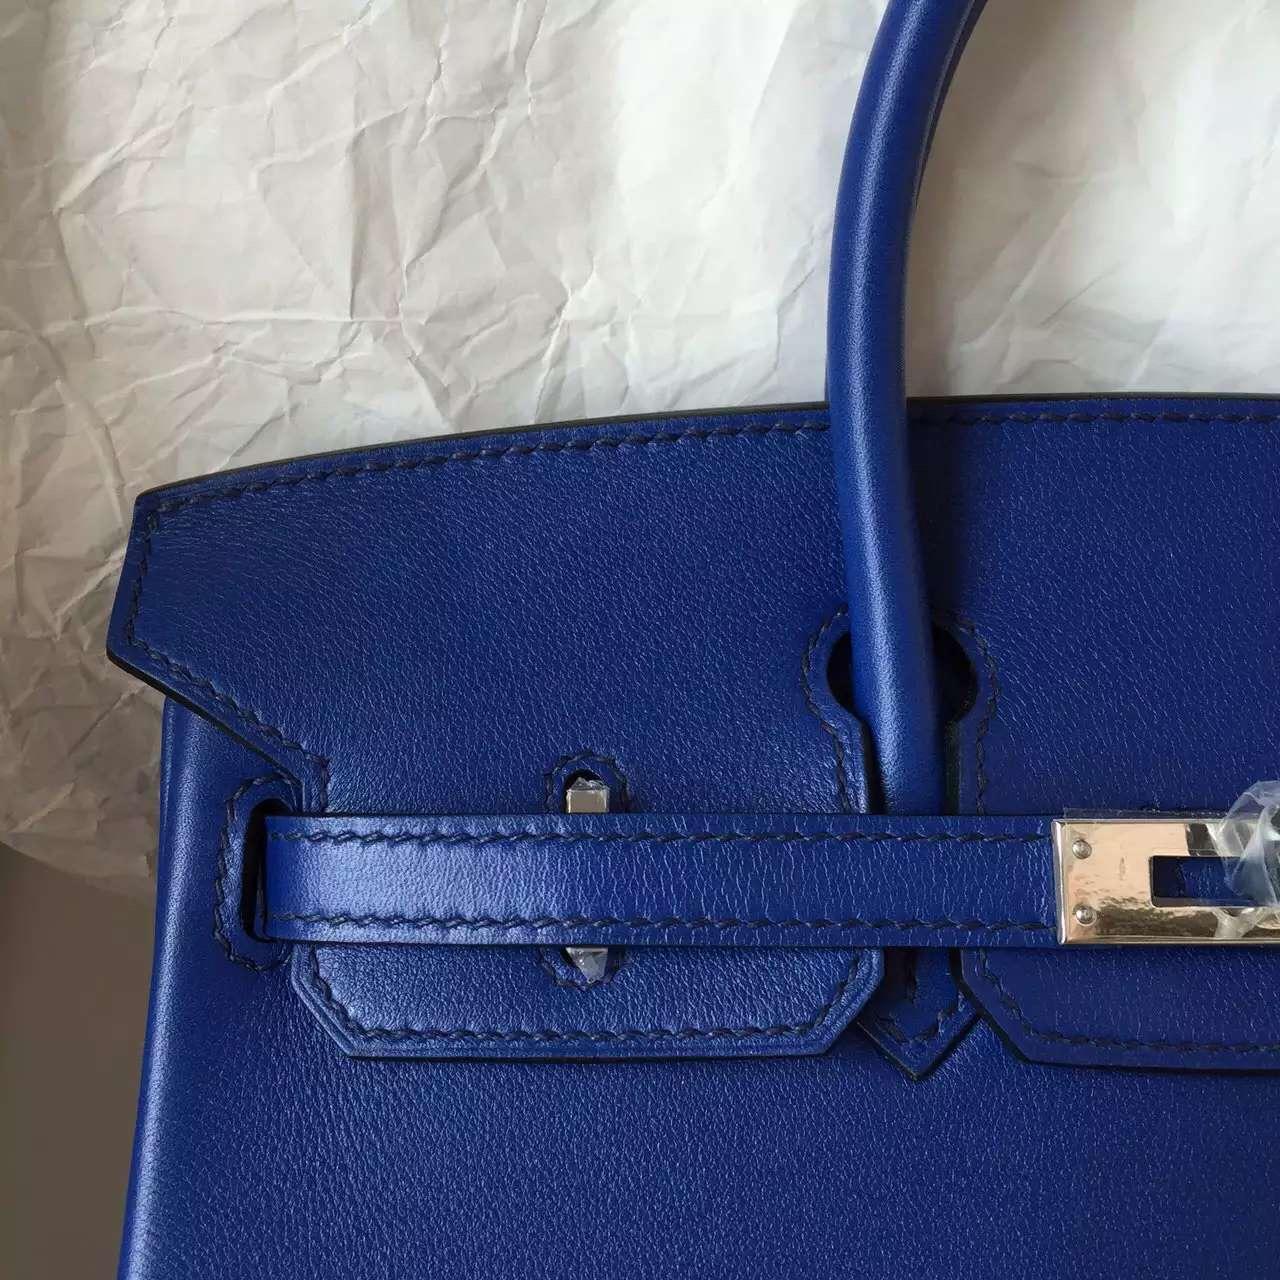 Hermes 7T Blue Electric Swift Leather Birkin Bag 25CM Elegant Women's Tote Bag